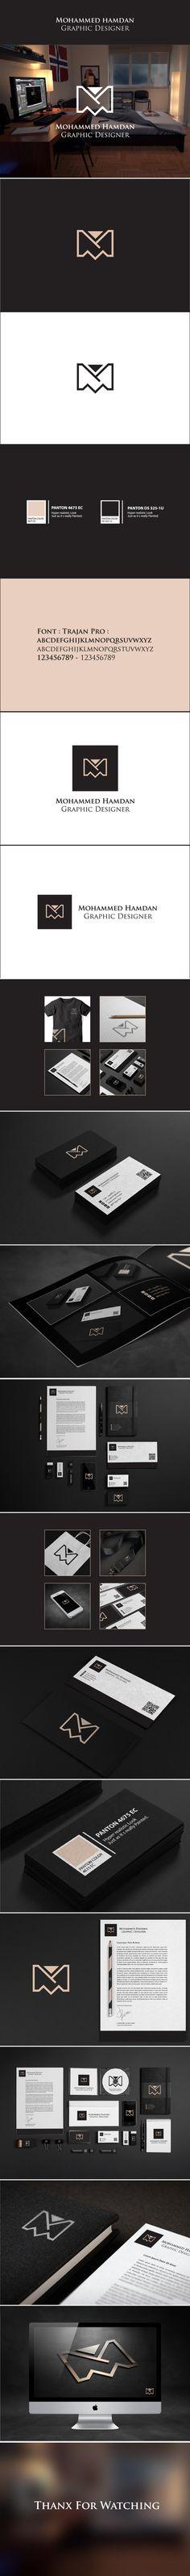 Personal Identity & Personal logo by mohammed hamdan, via Behance   #stationary #corporate #design #corporatedesign #identity #branding #marketing < repinned by www.BlickeDeeler.de   Take a look at www.LogoGestaltung-Hamburg.de